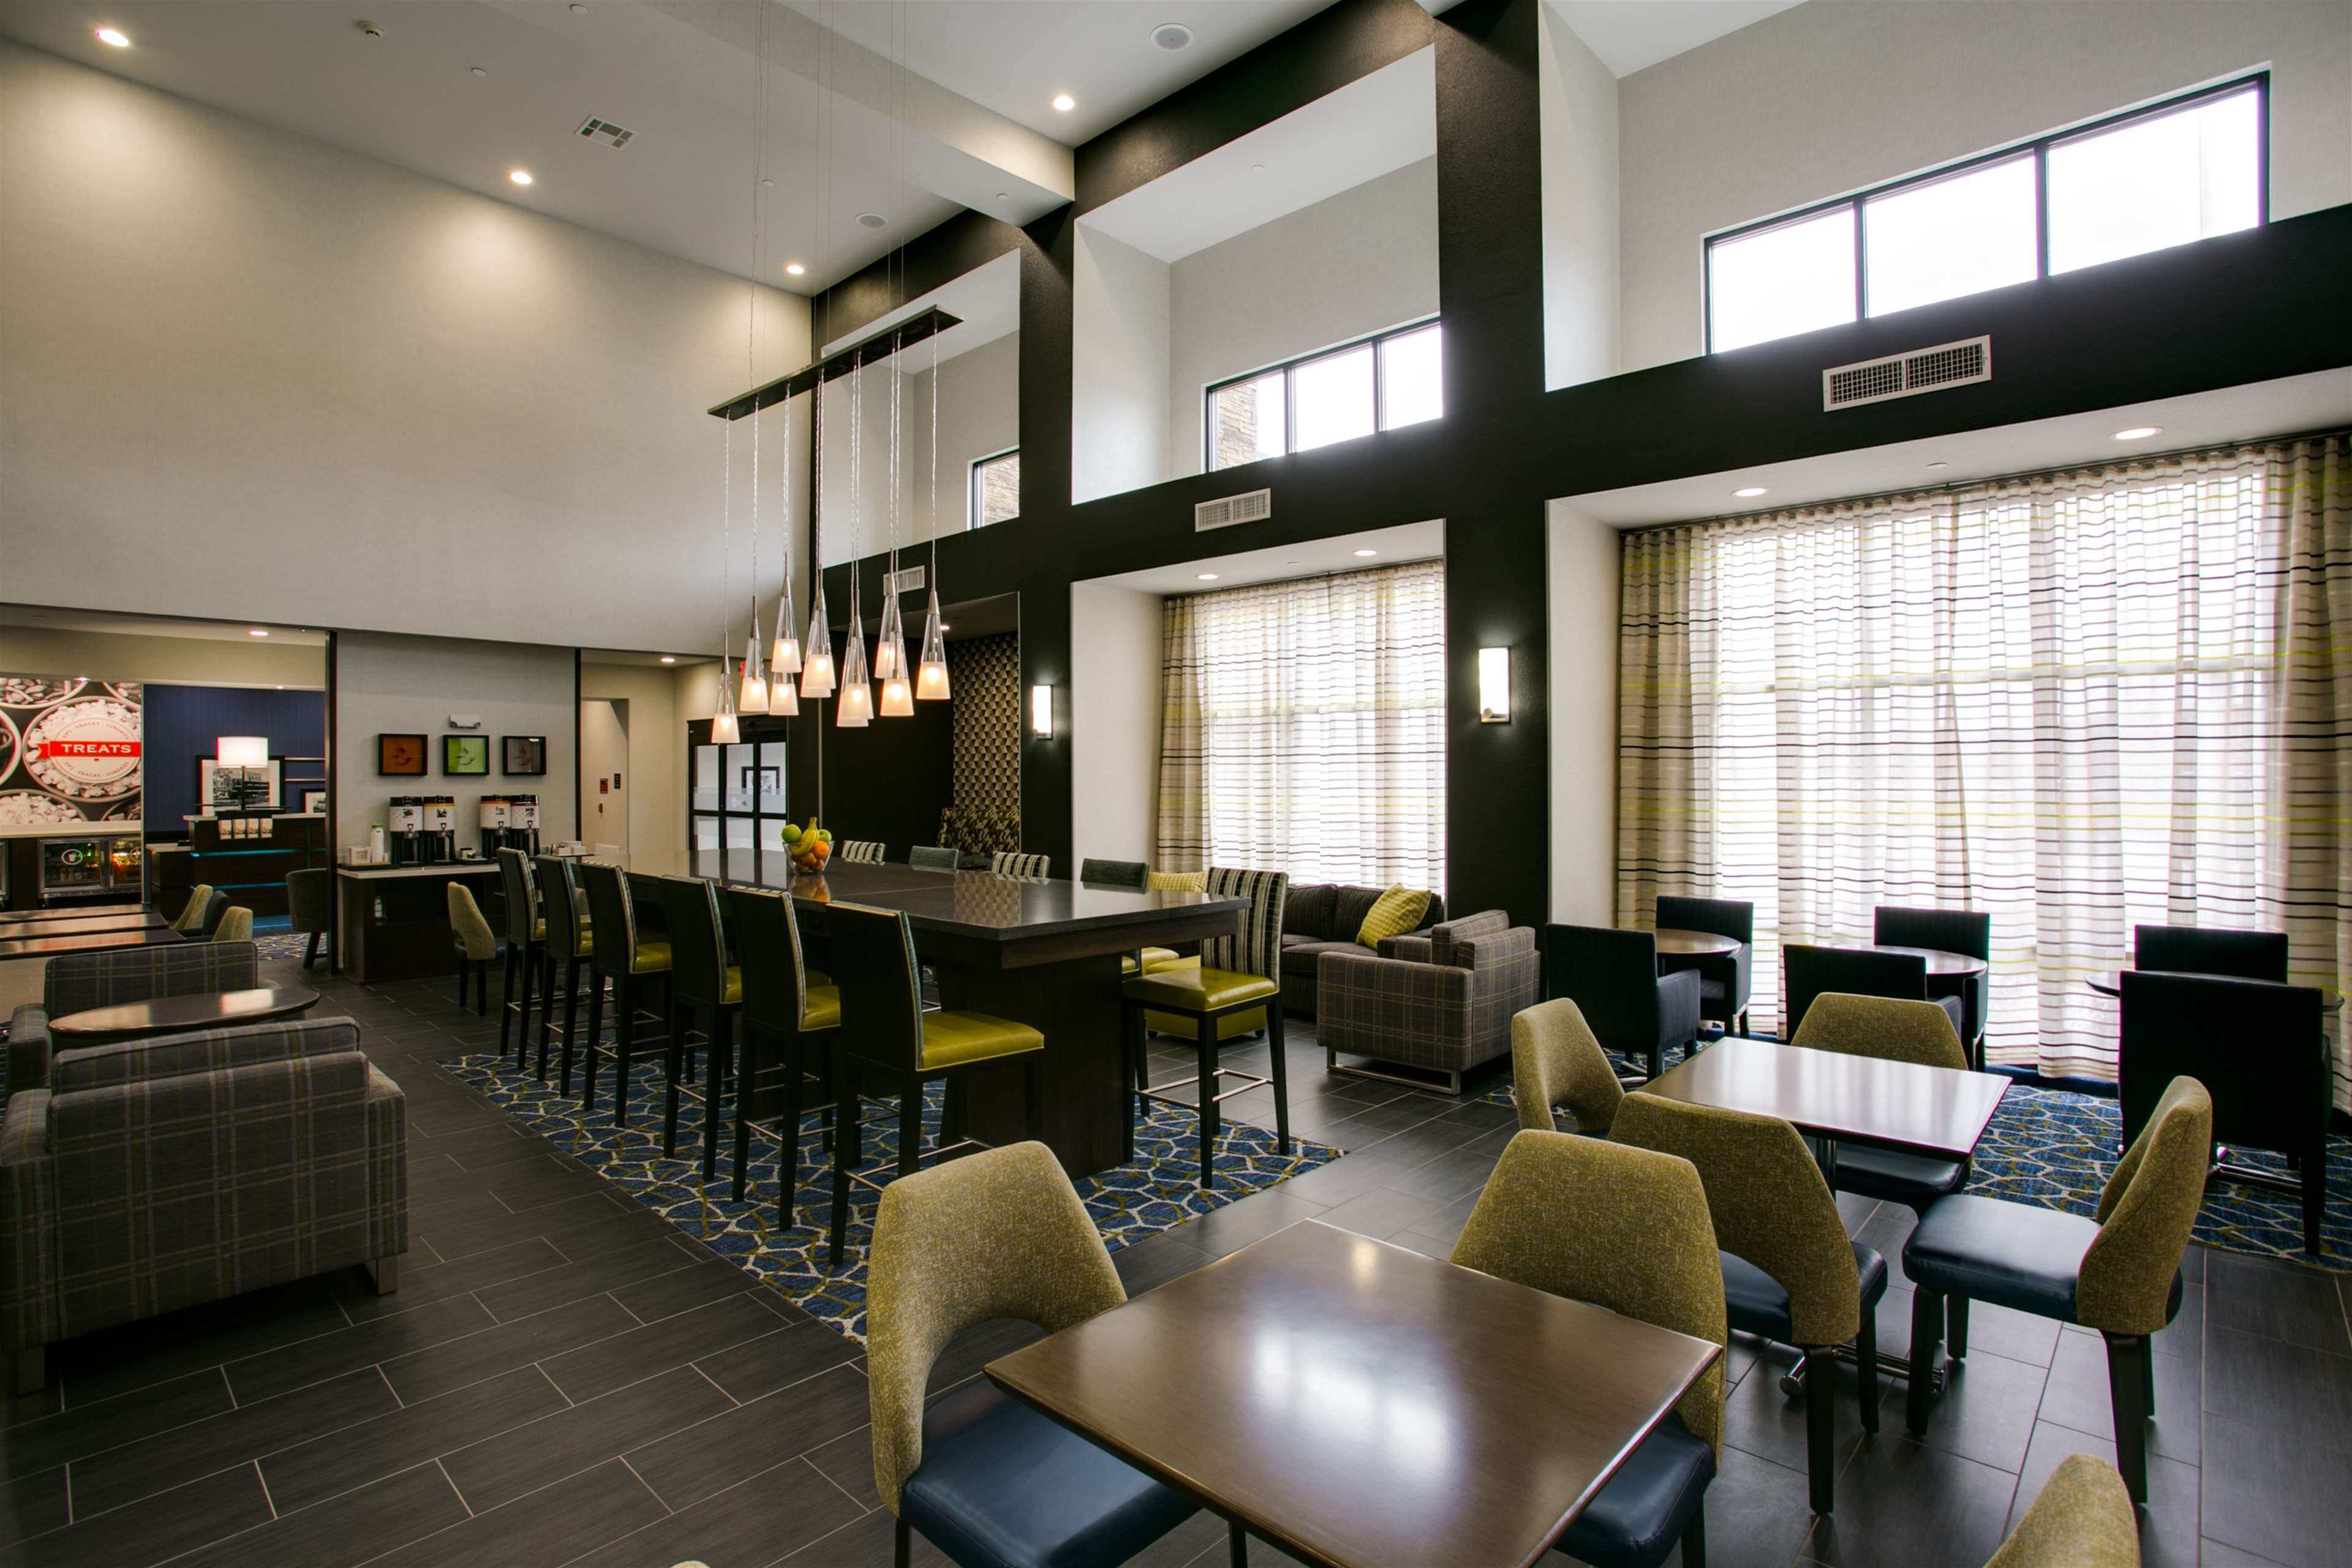 Hampton Inn & Suites Dallas/Ft. Worth Airport South image 6